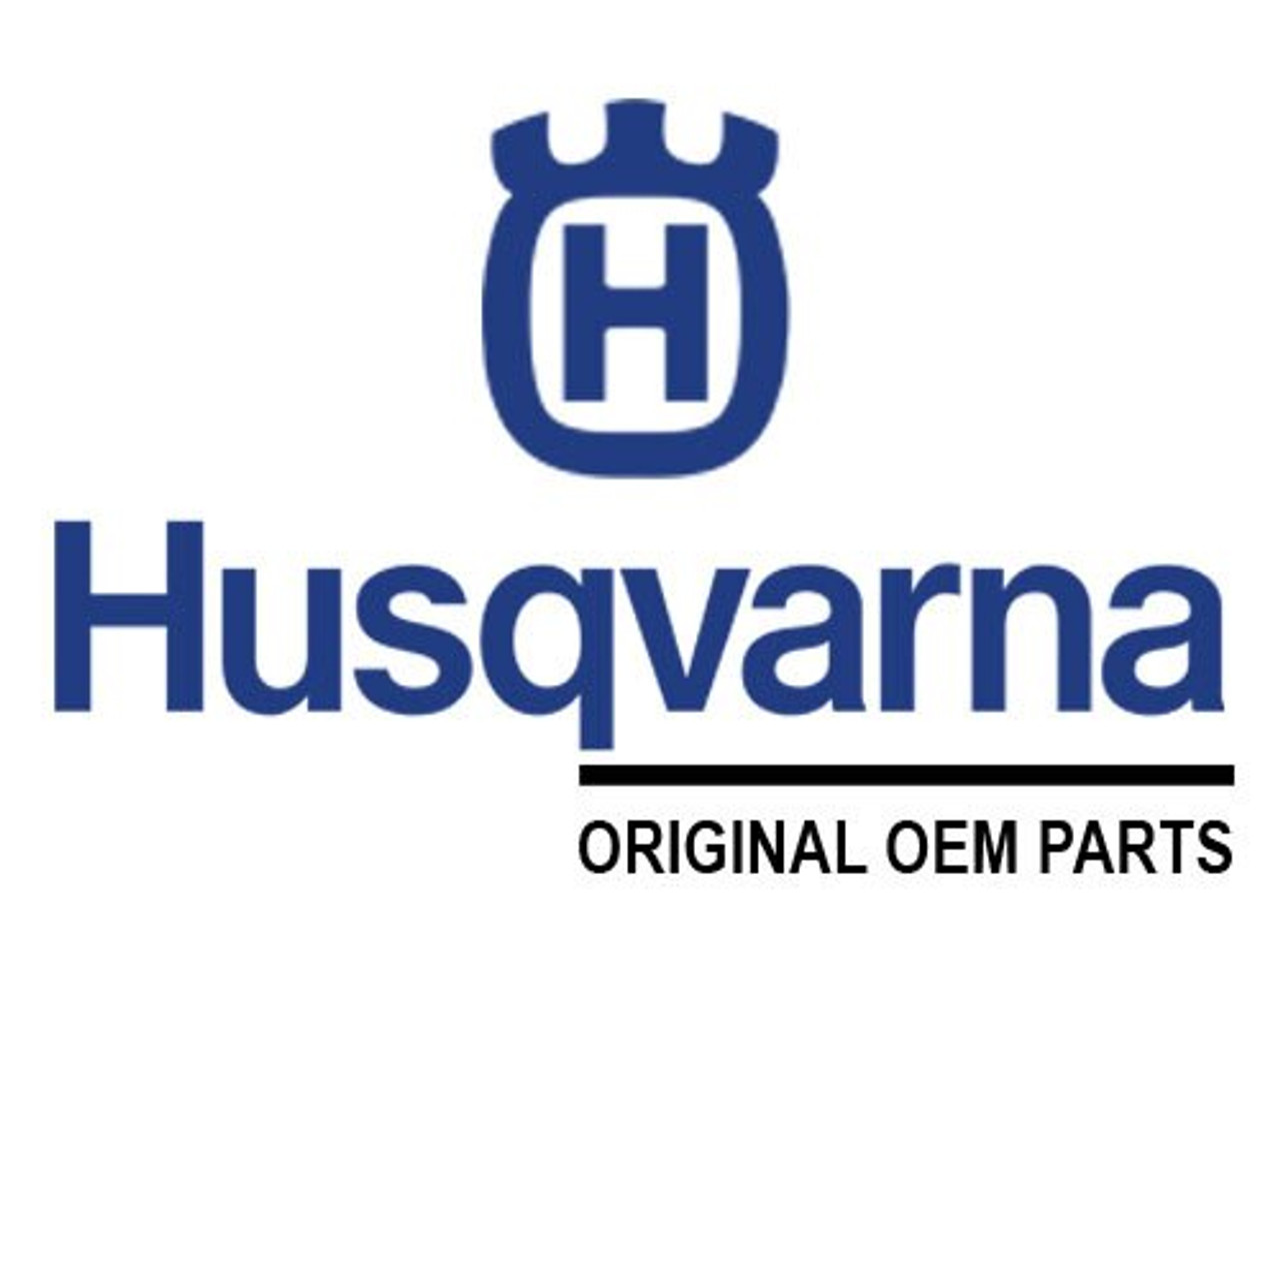 HUSQVARNA 16 Bar Hl180-56 3/8 (Cs) 531300445 Image 1